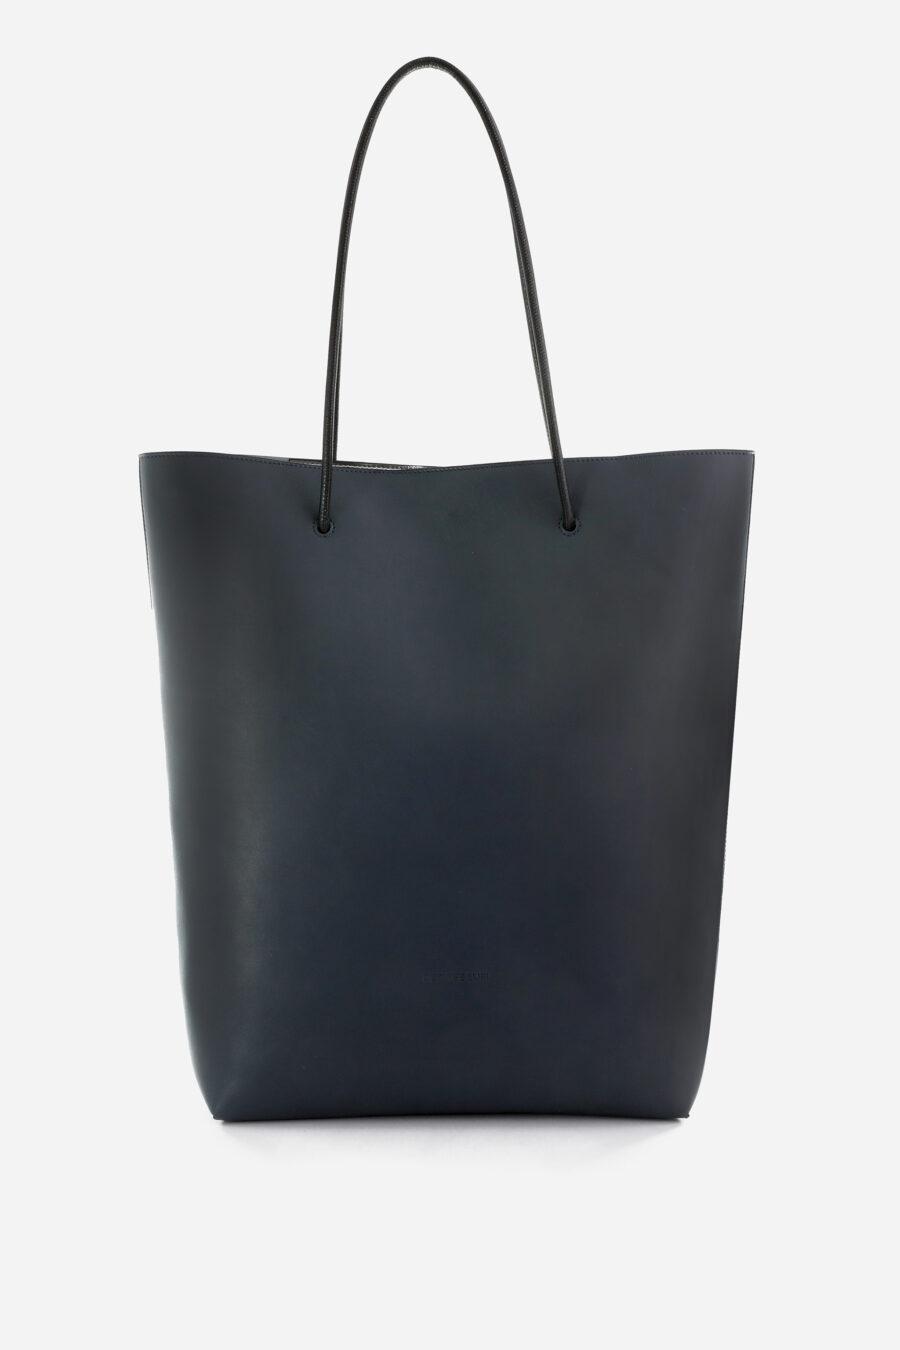 SHOPPING-BAG-KELLY-PELLE-NAPPA-GRAFITE_1